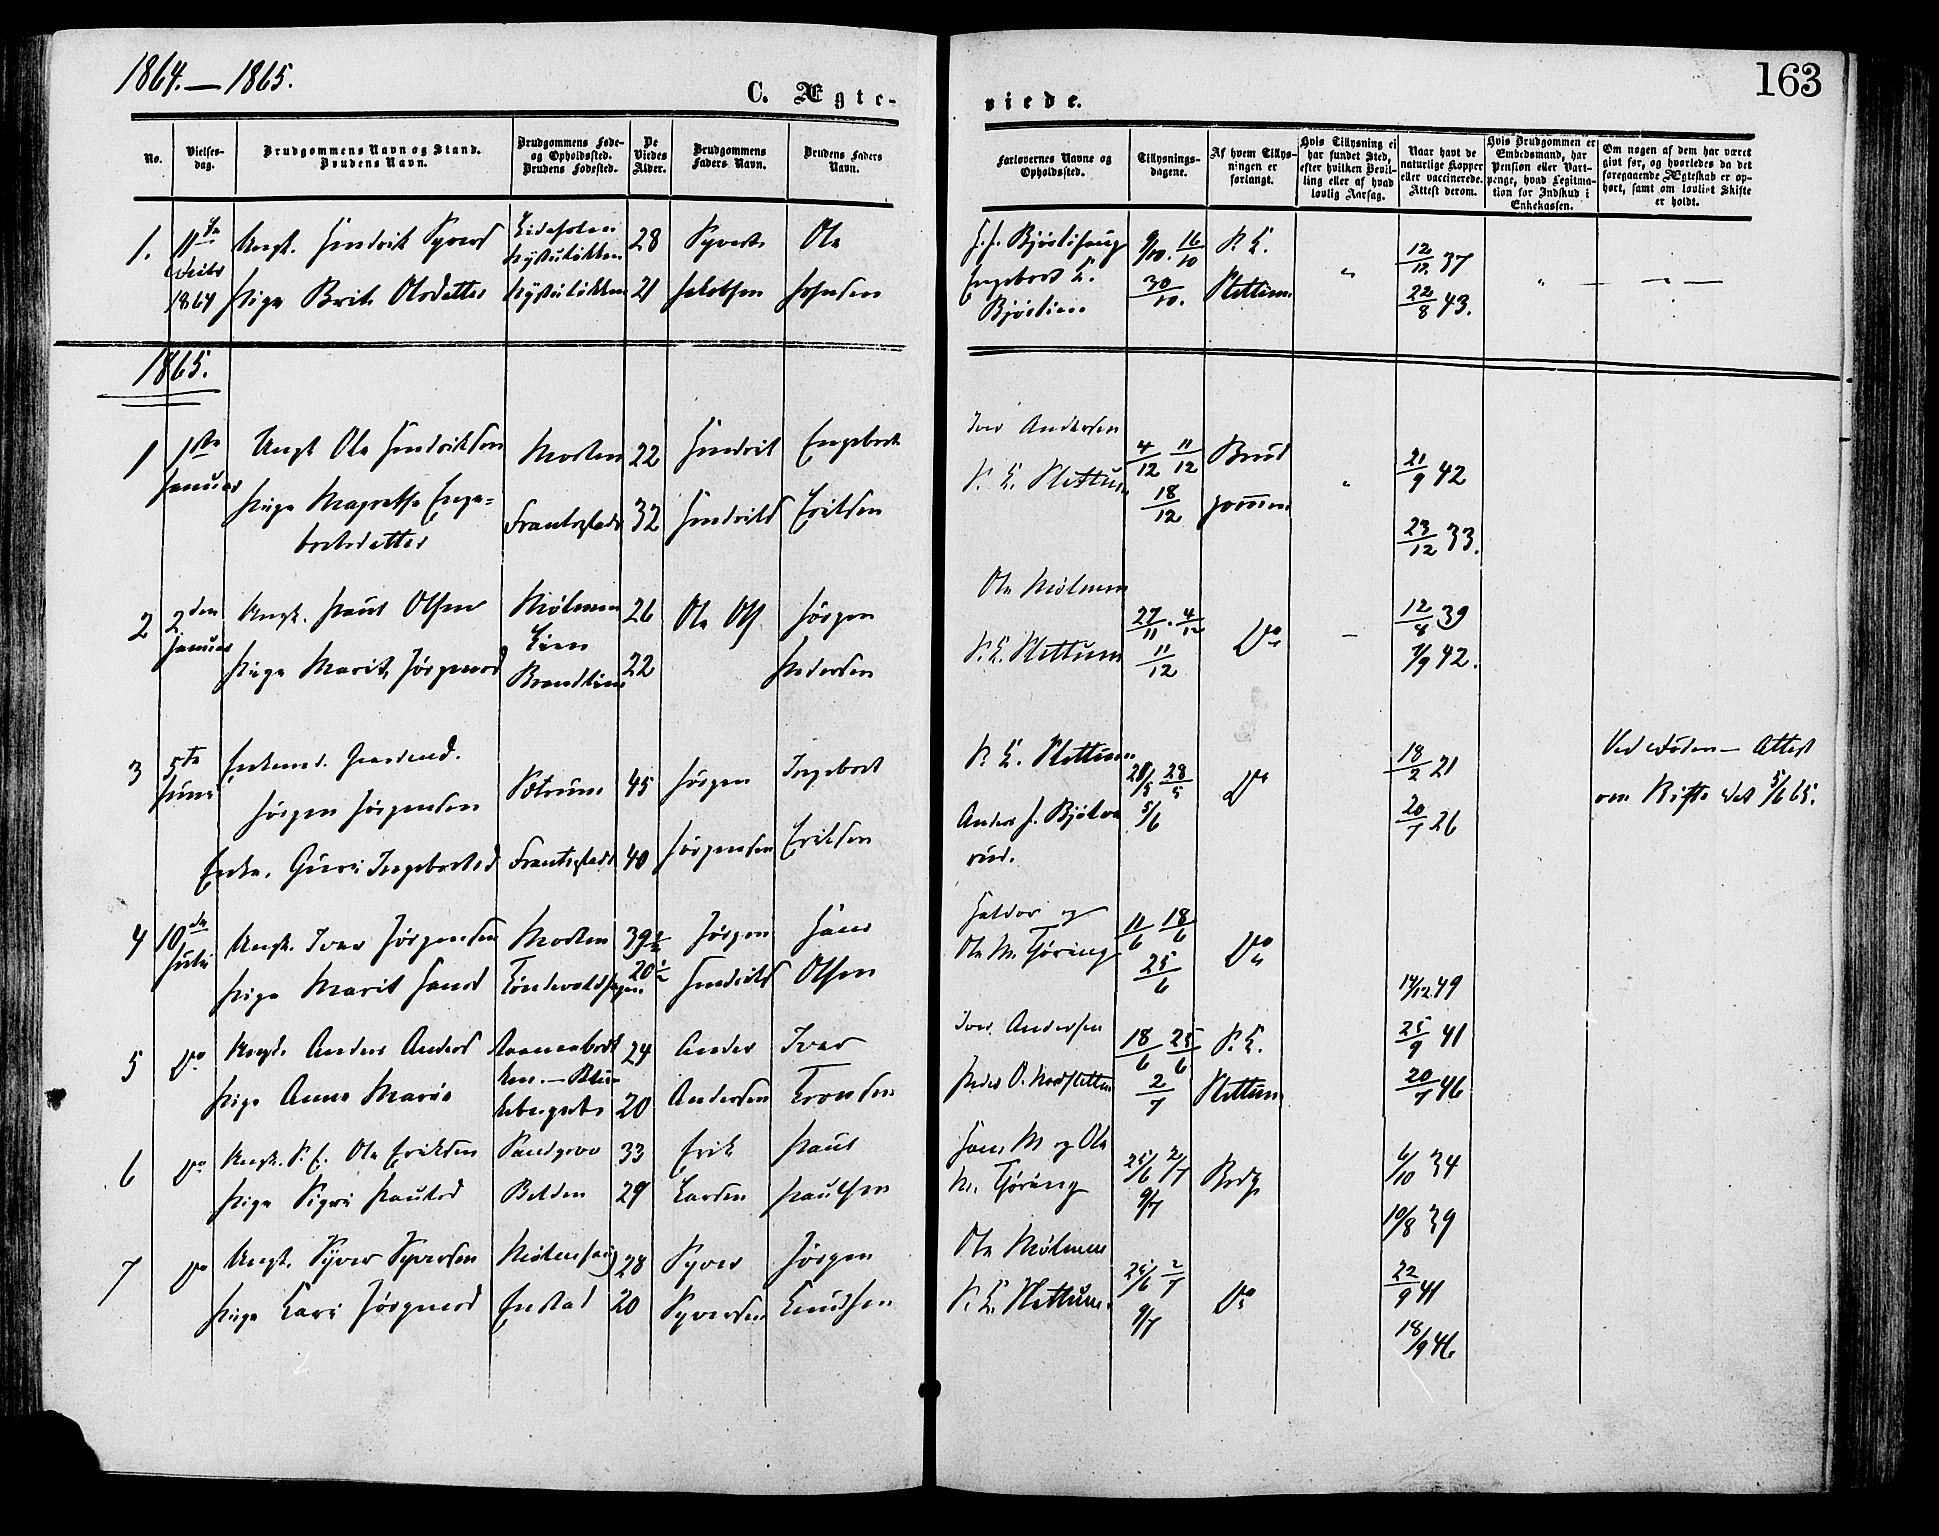 SAH, Lesja prestekontor, Ministerialbok nr. 9, 1854-1889, s. 163